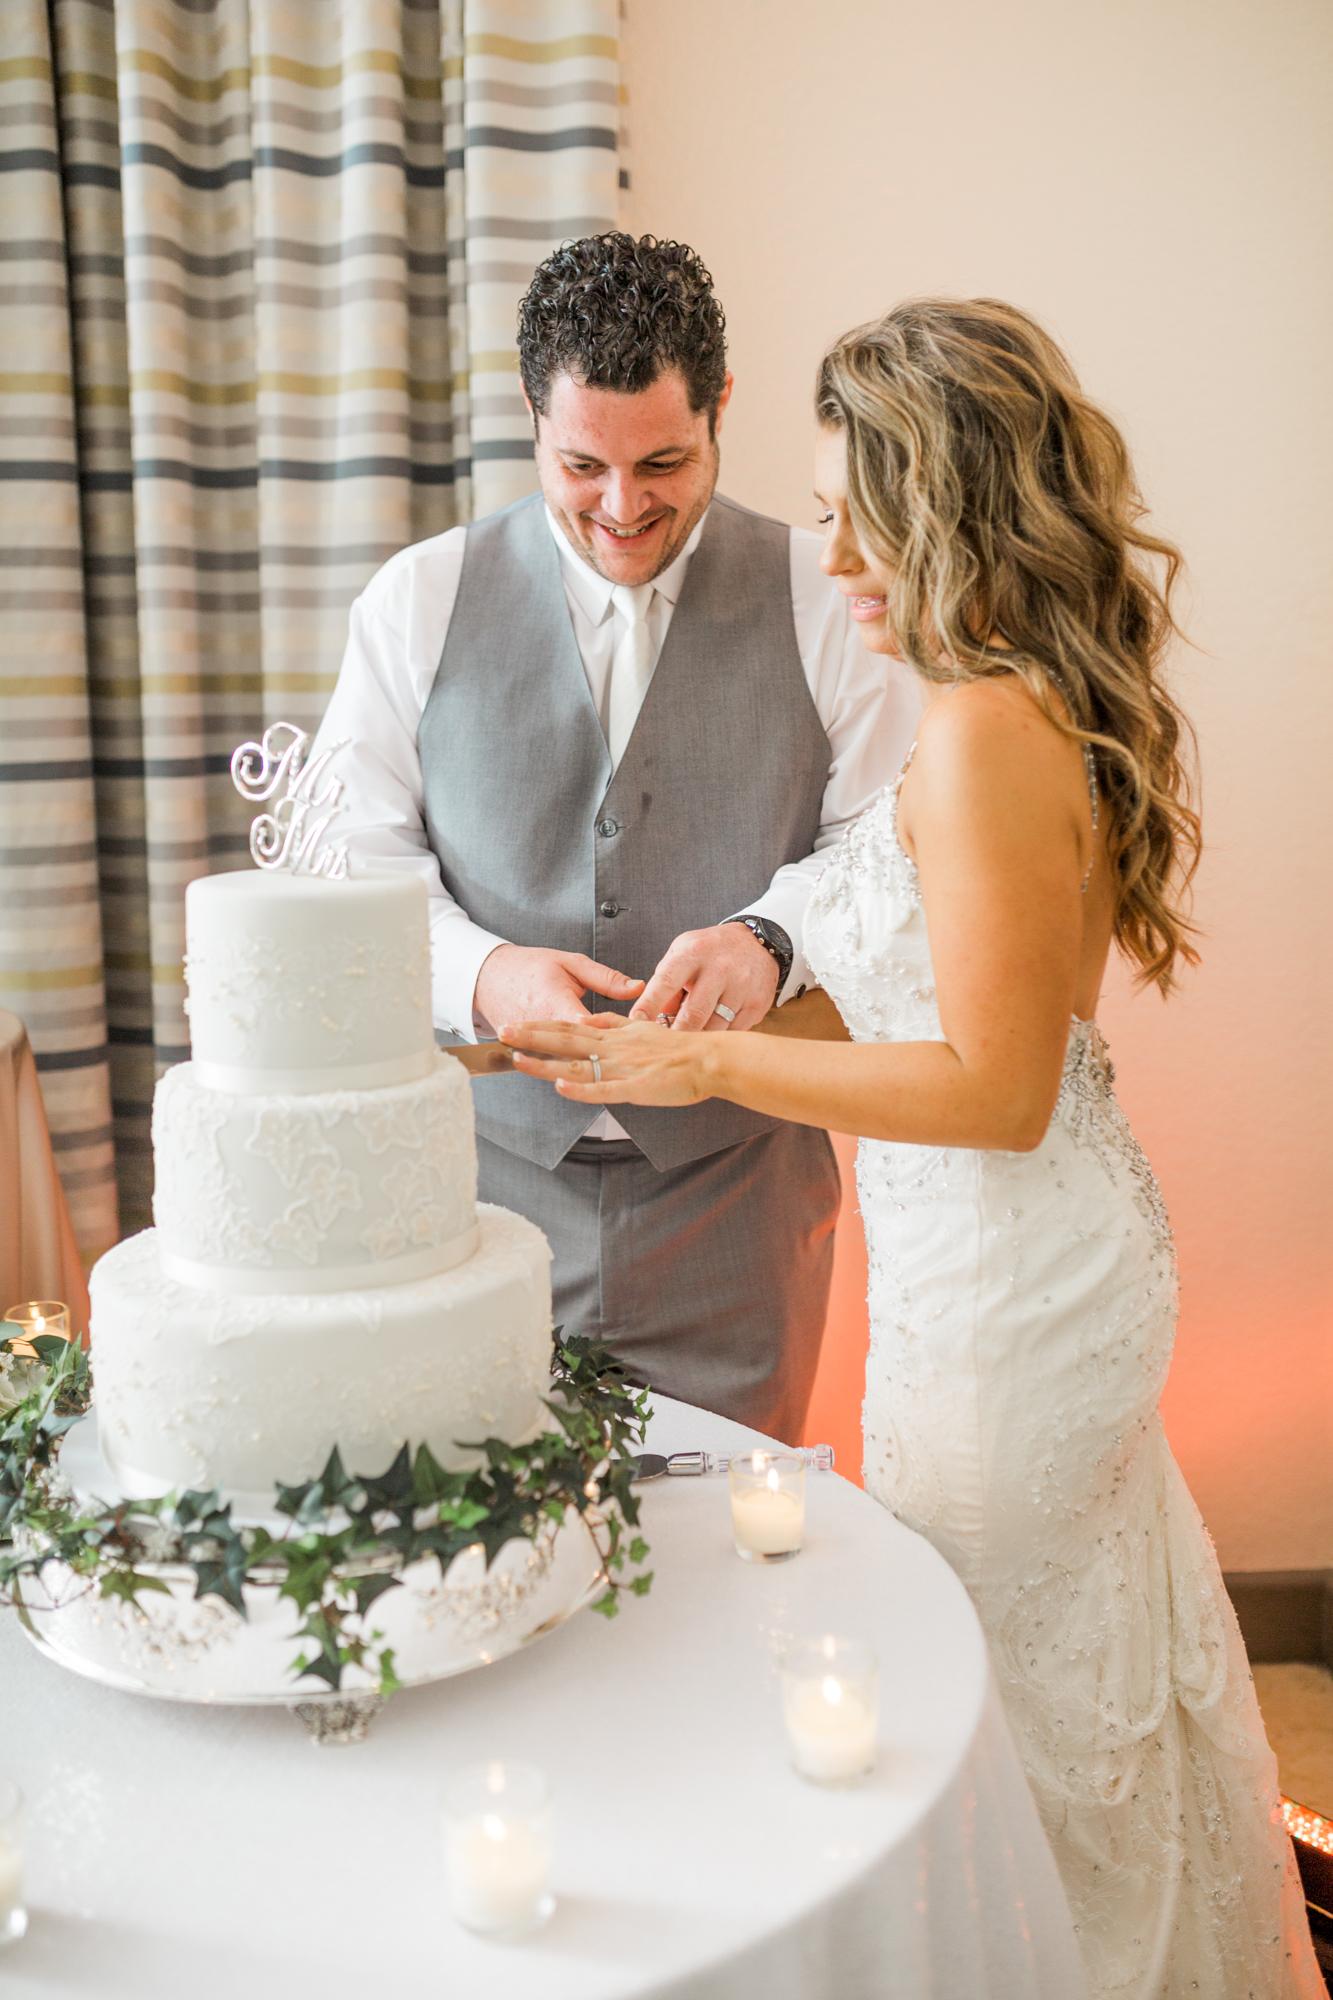 jessica-bellinger-photography-harmony-golf-preserve-wedding-photos-9735.jpg